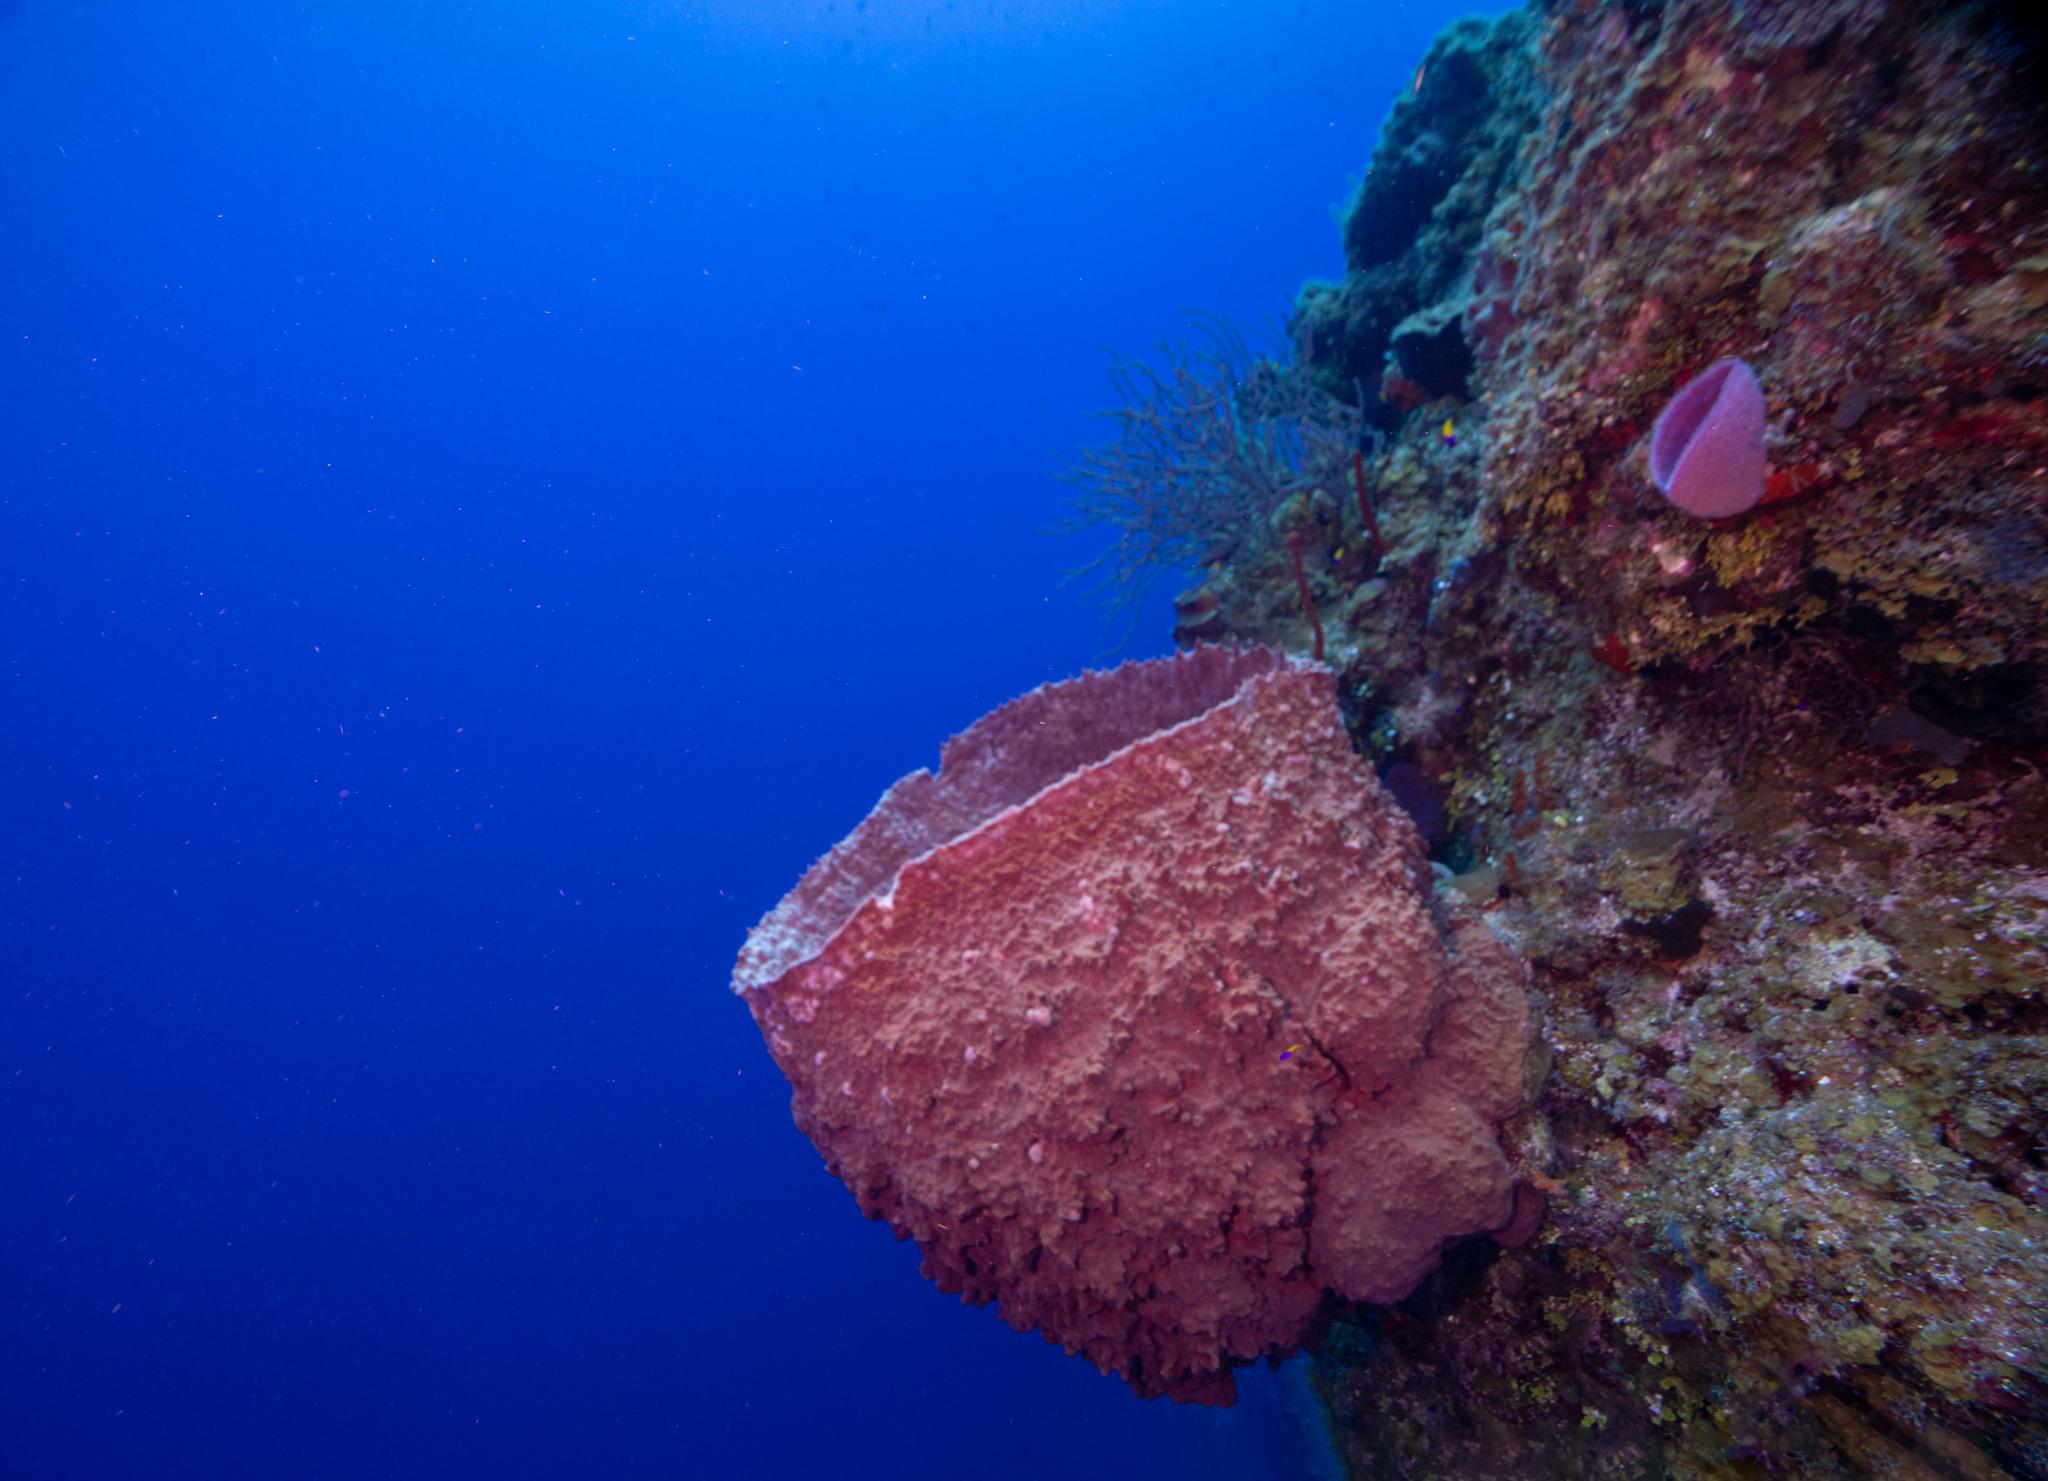 Giant Barrel Sponge